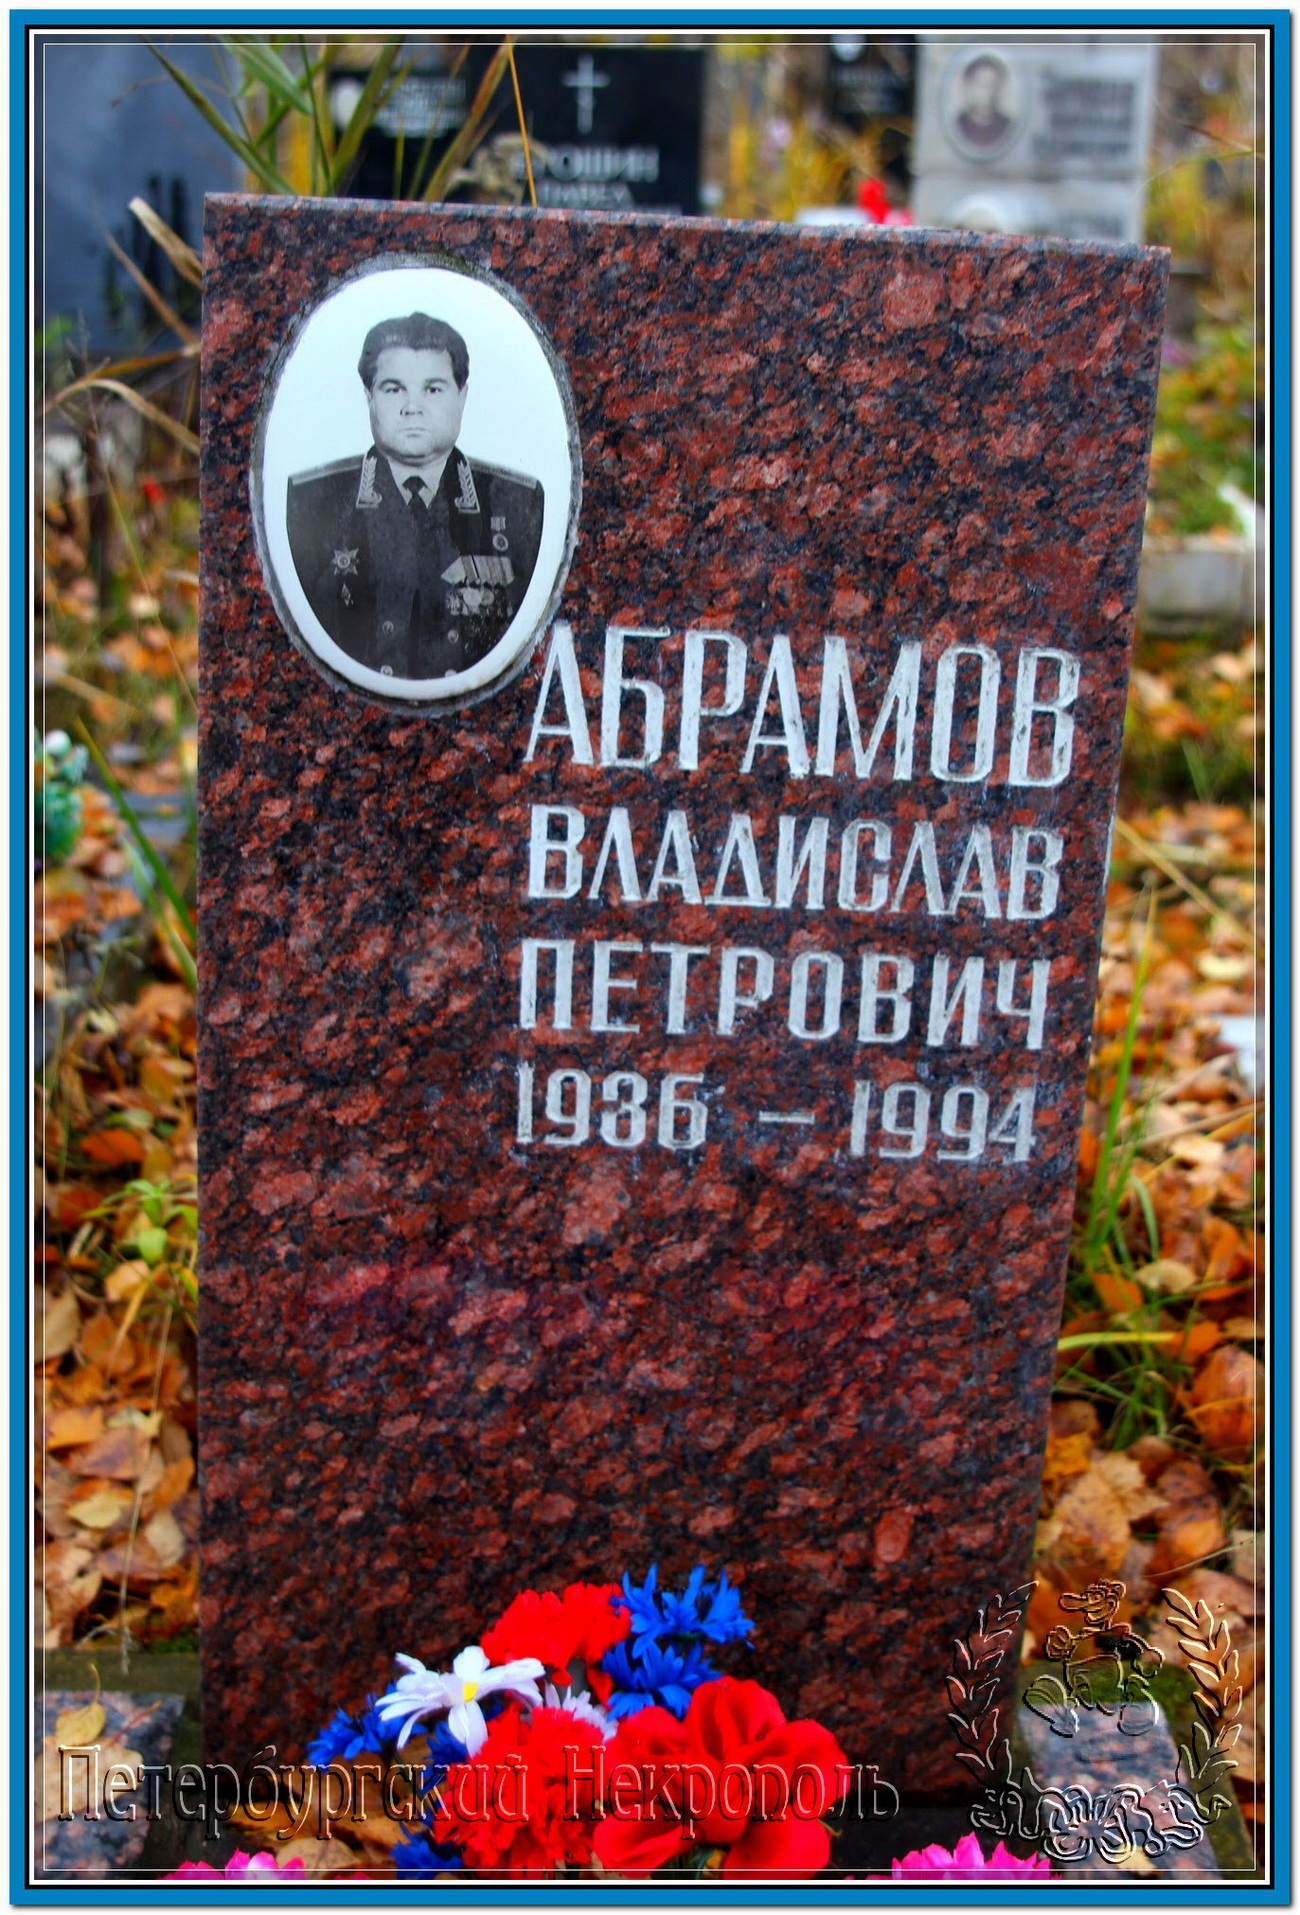 © Абрамов Владислав Петрович